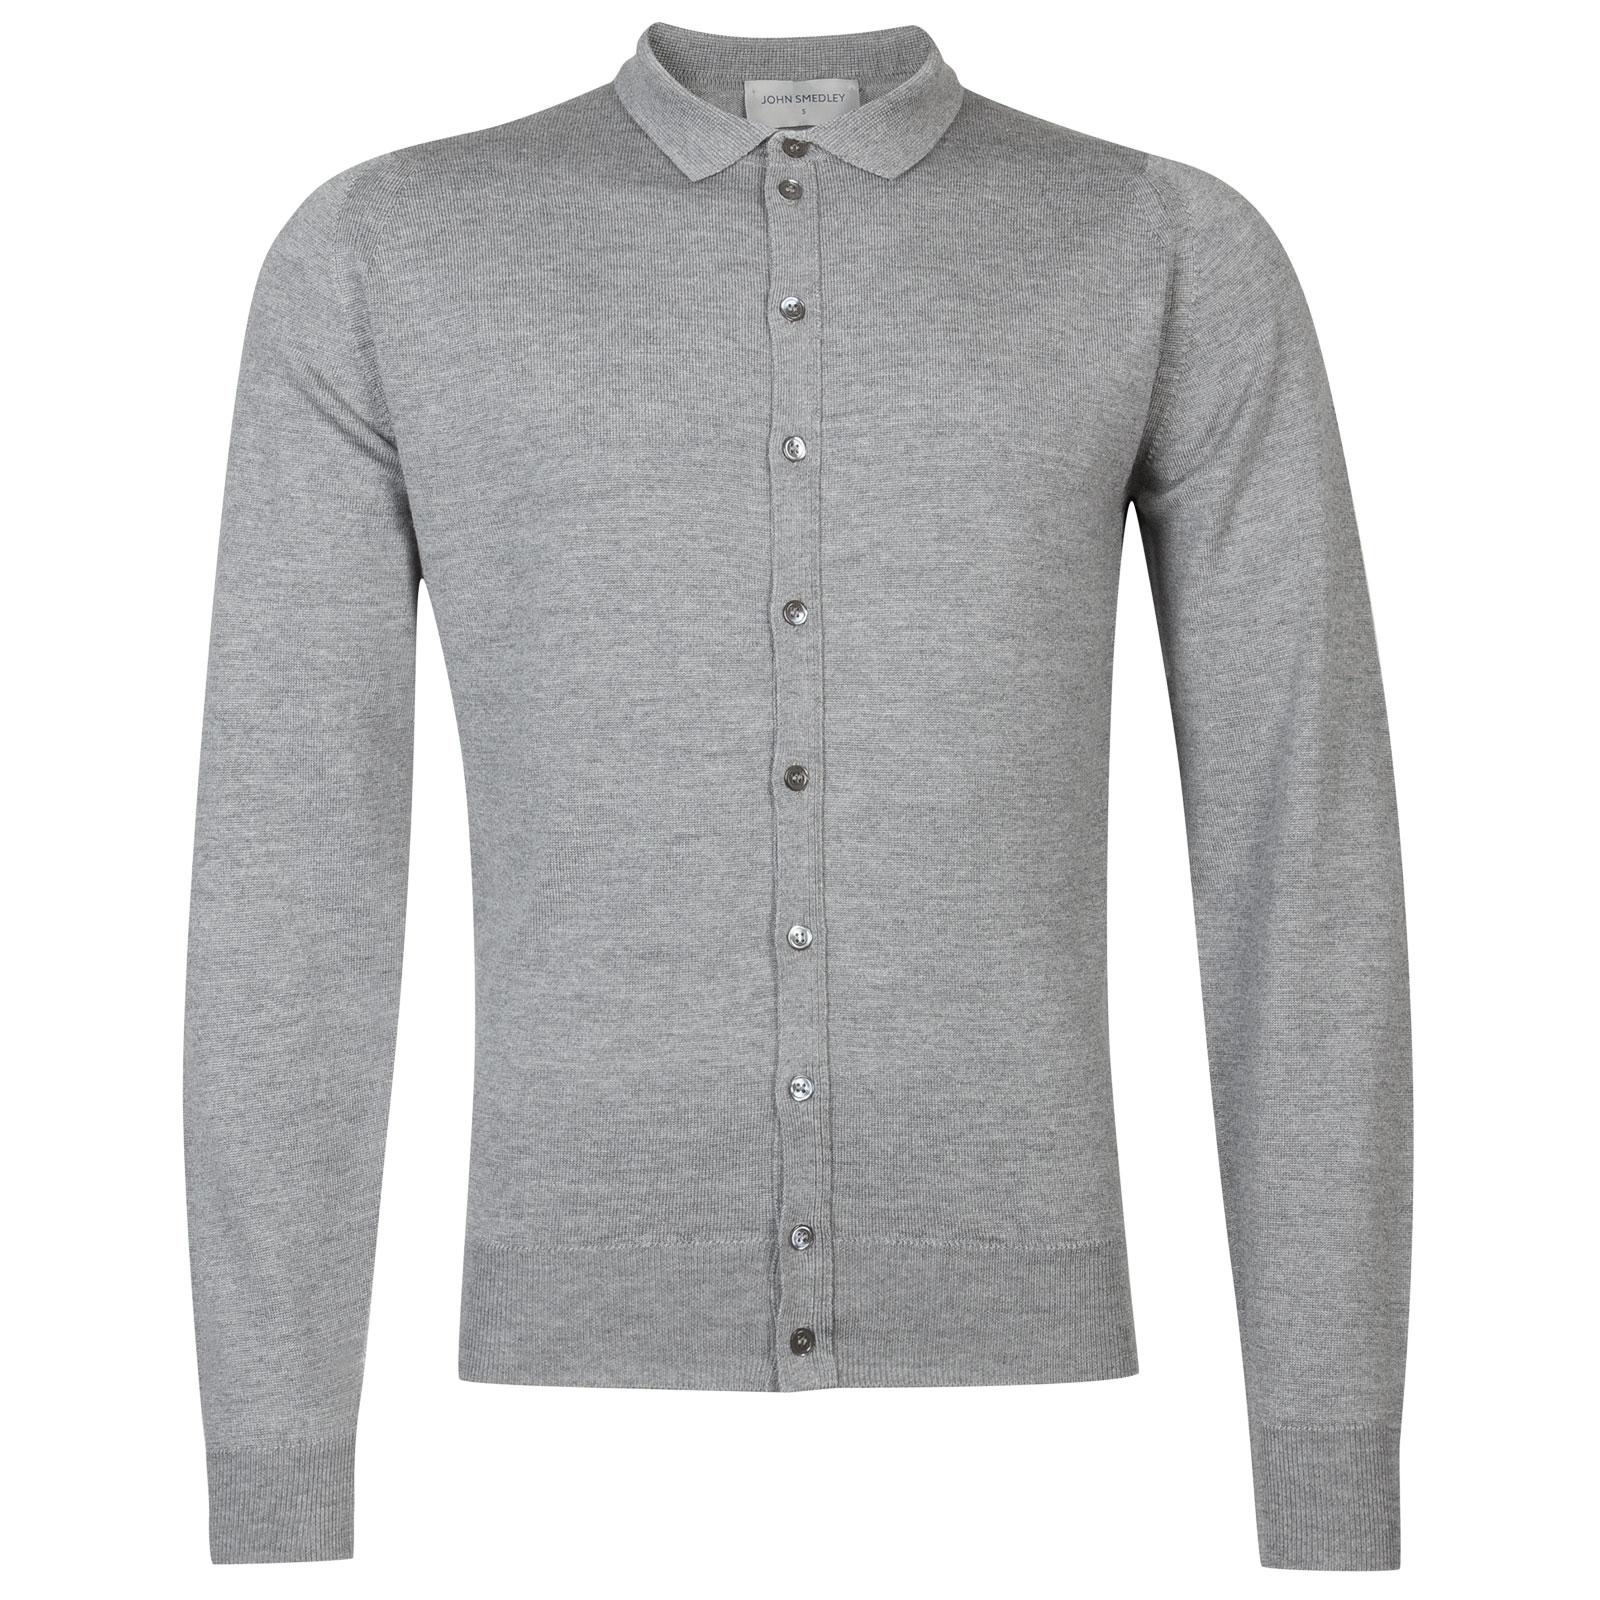 John Smedley Parwish Merino Wool Shirt in Silver-M